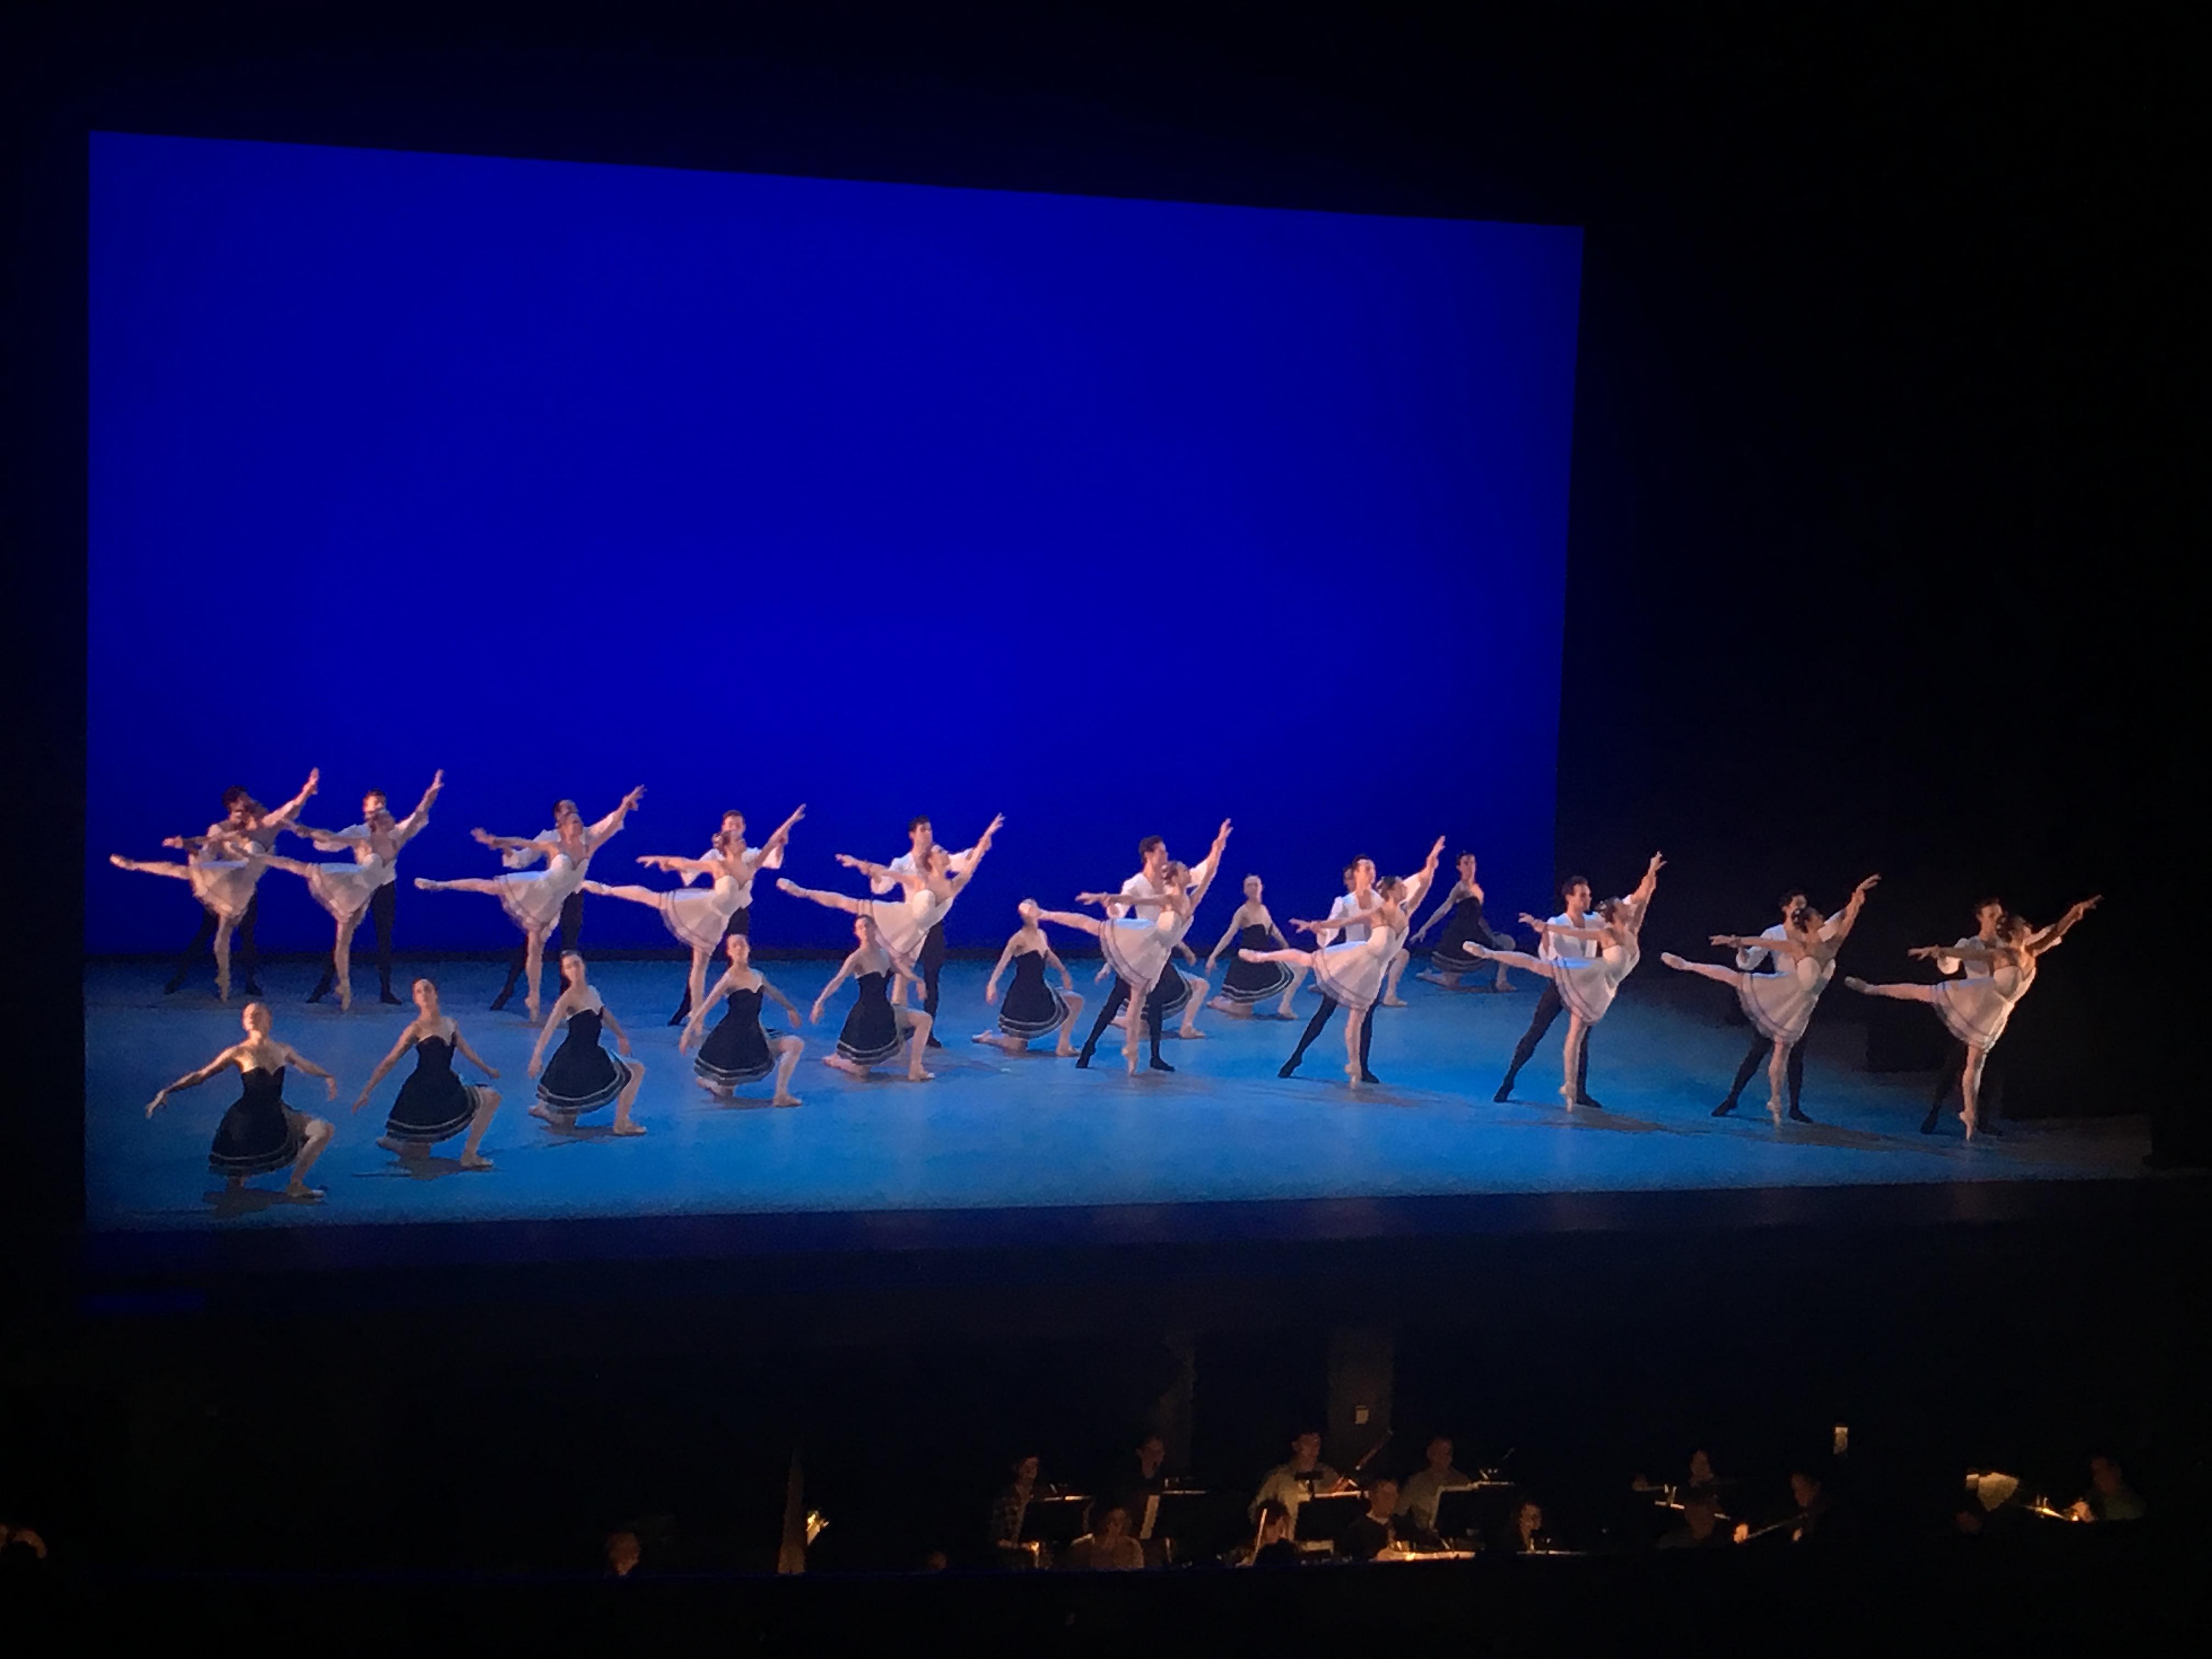 GQ Ballroom Takes in the Suzanne Farrell Ballet | GQ Ballroom